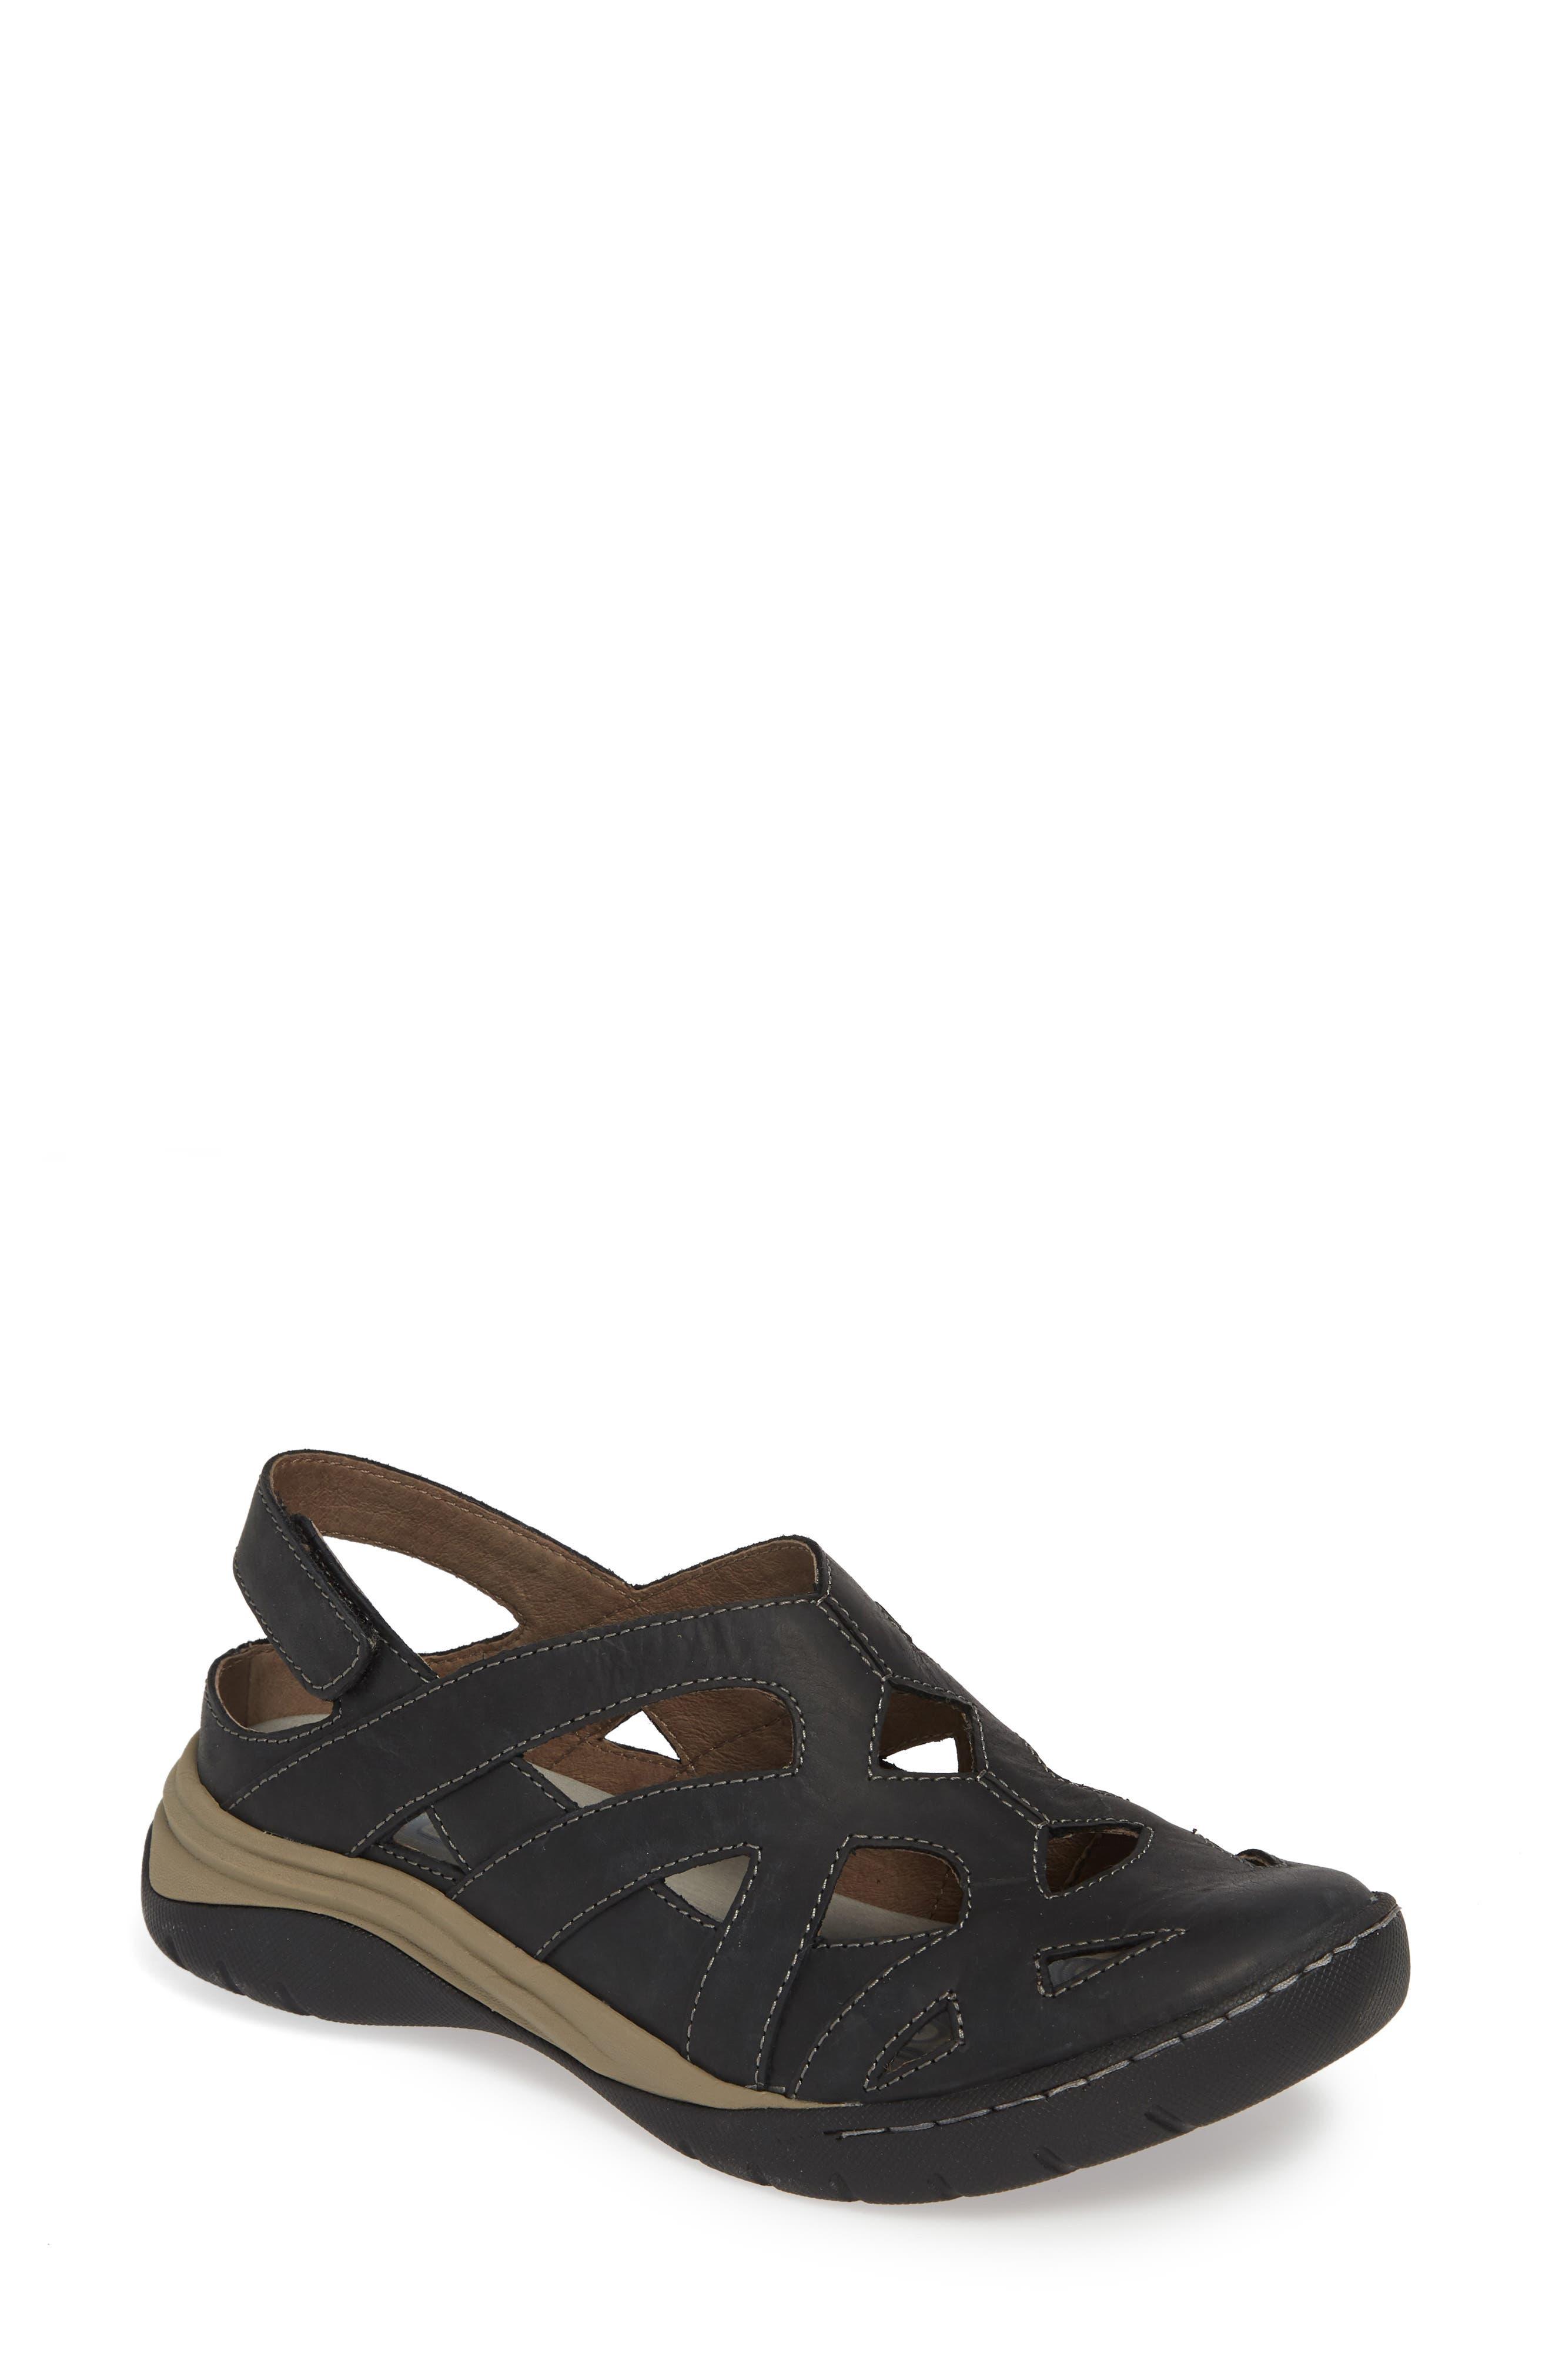 Maclean 2 Sandal